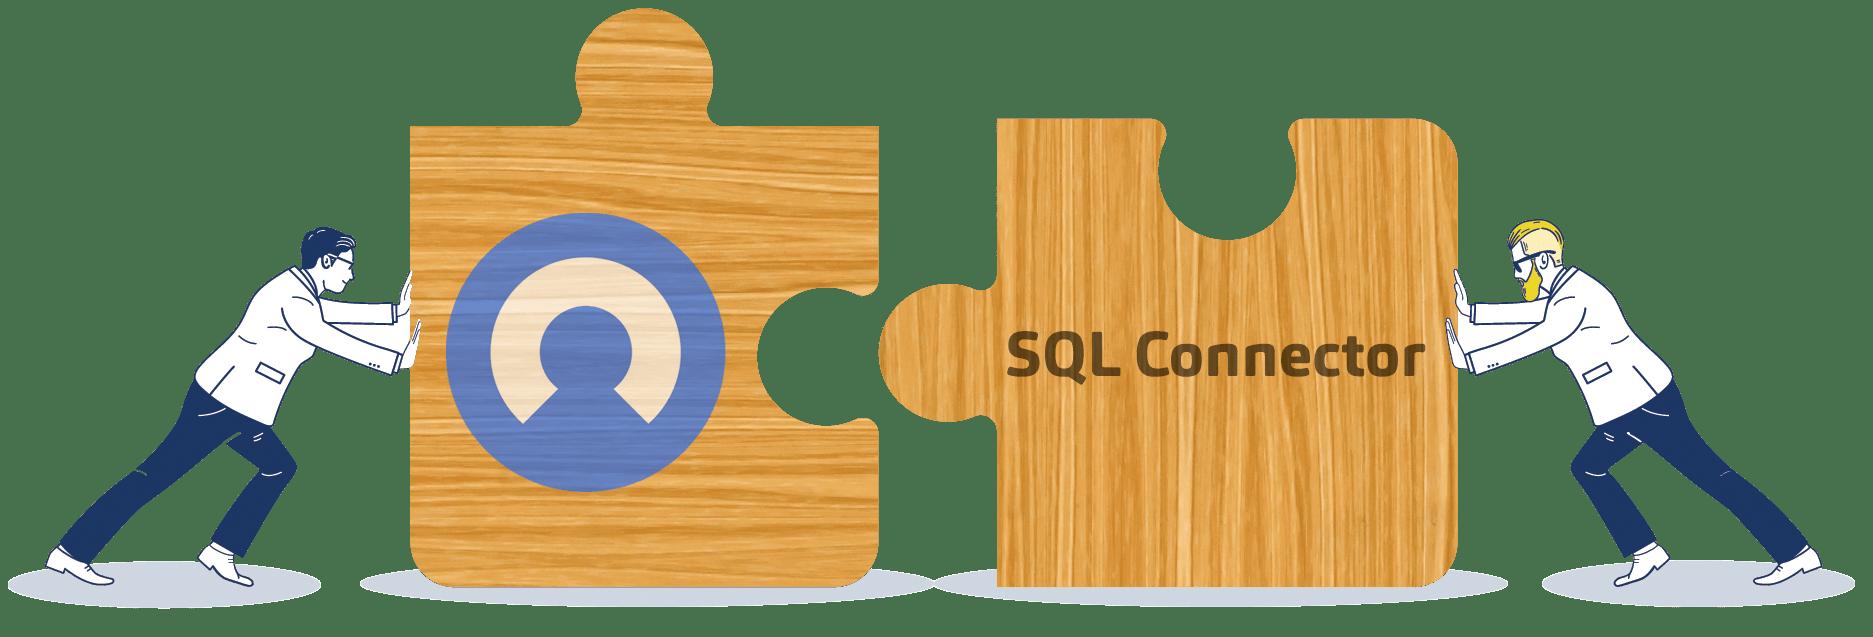 SQL Connector + slimme telefonie